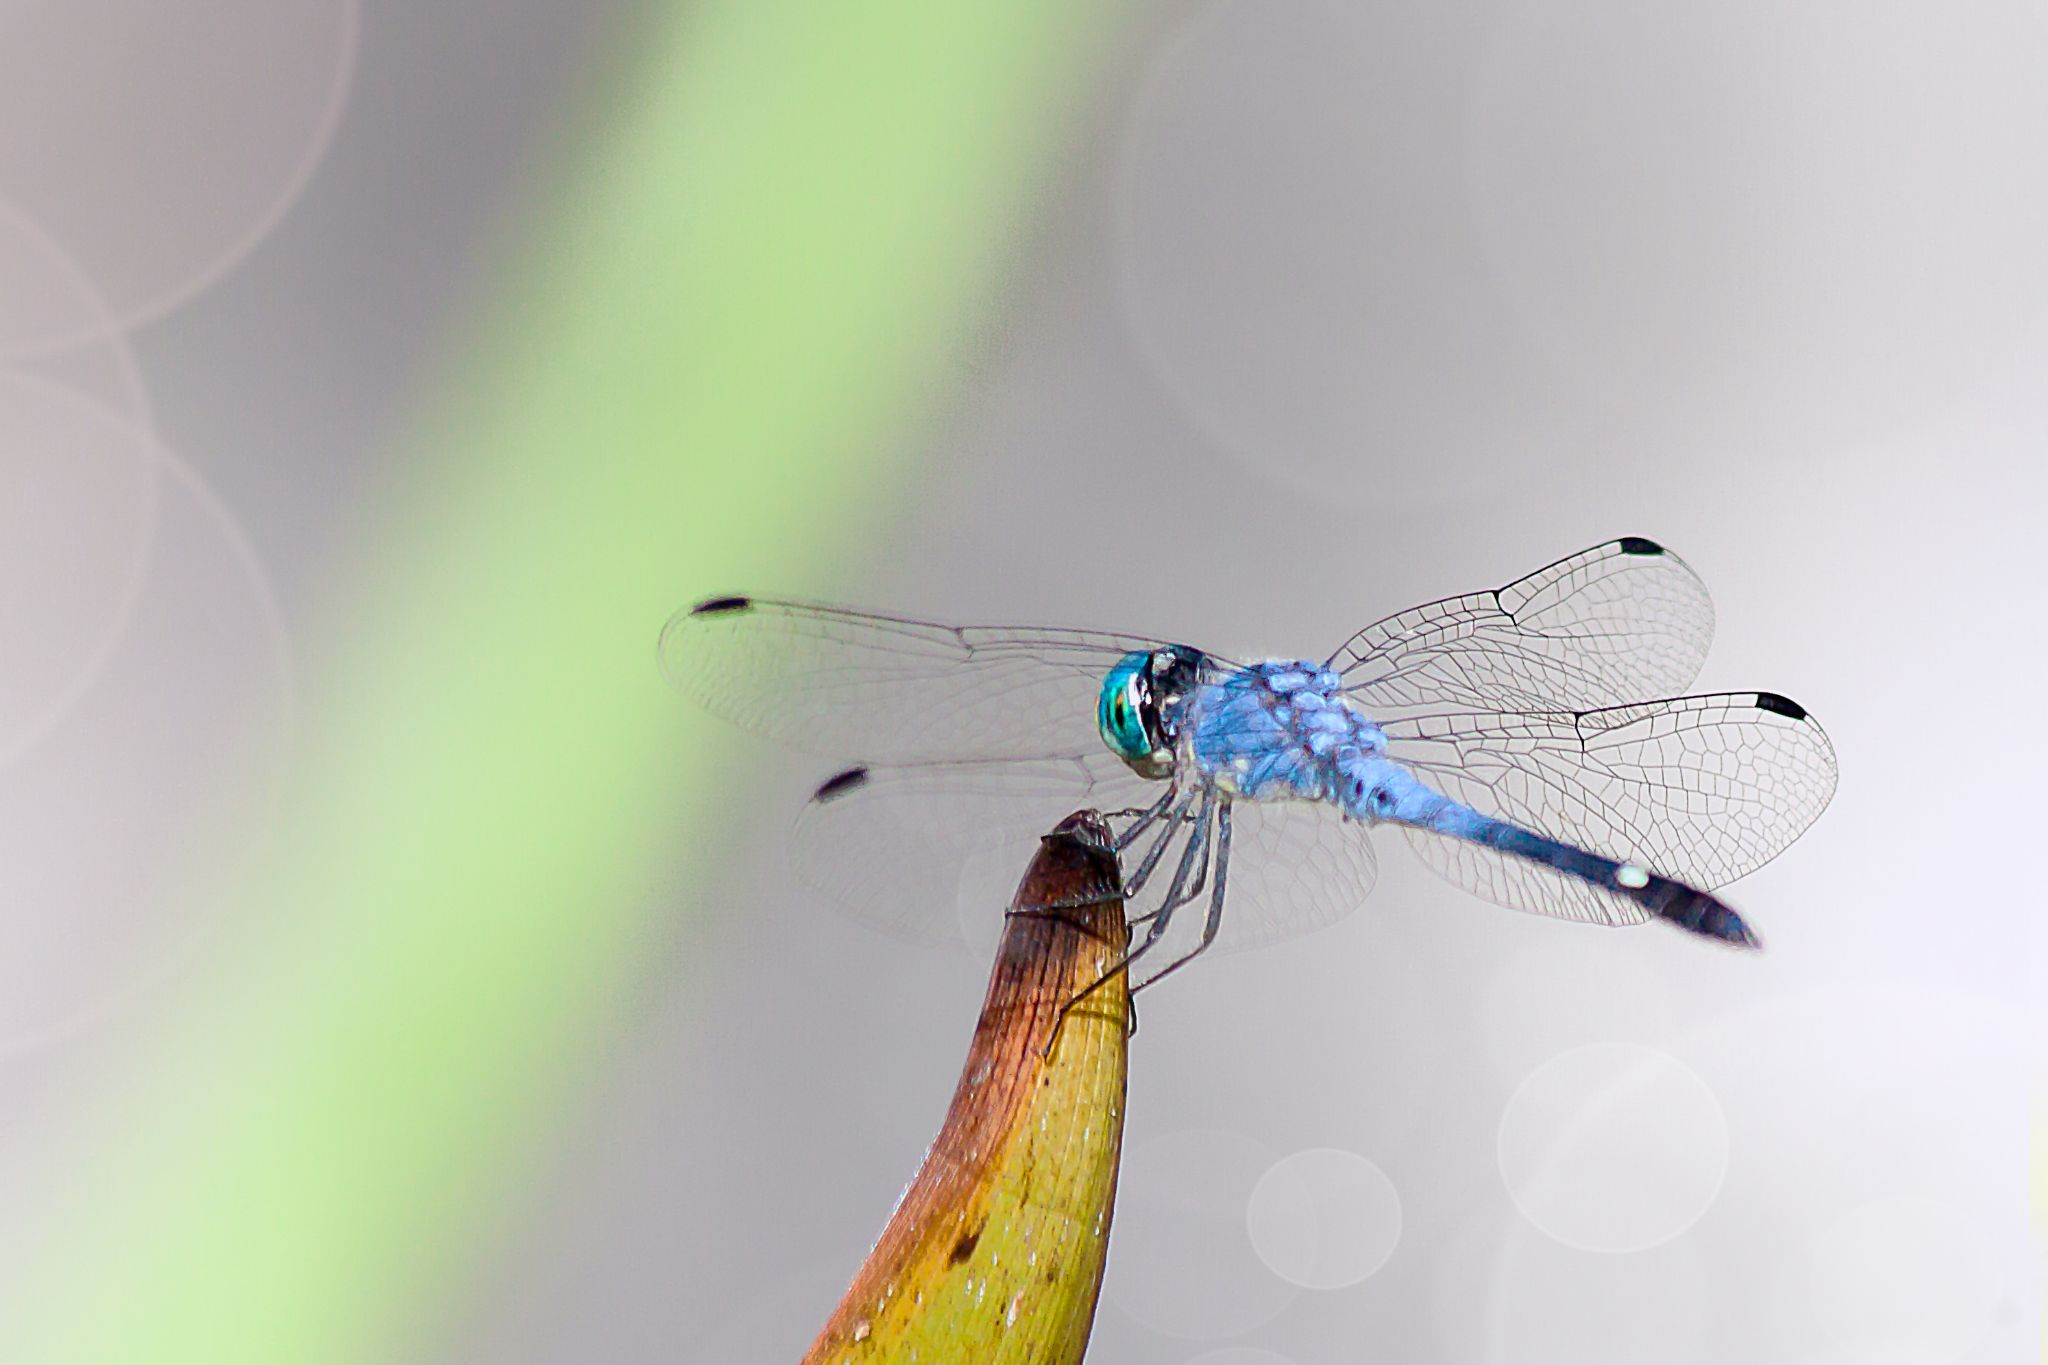 Blue Dragonfly by Tony Guzman